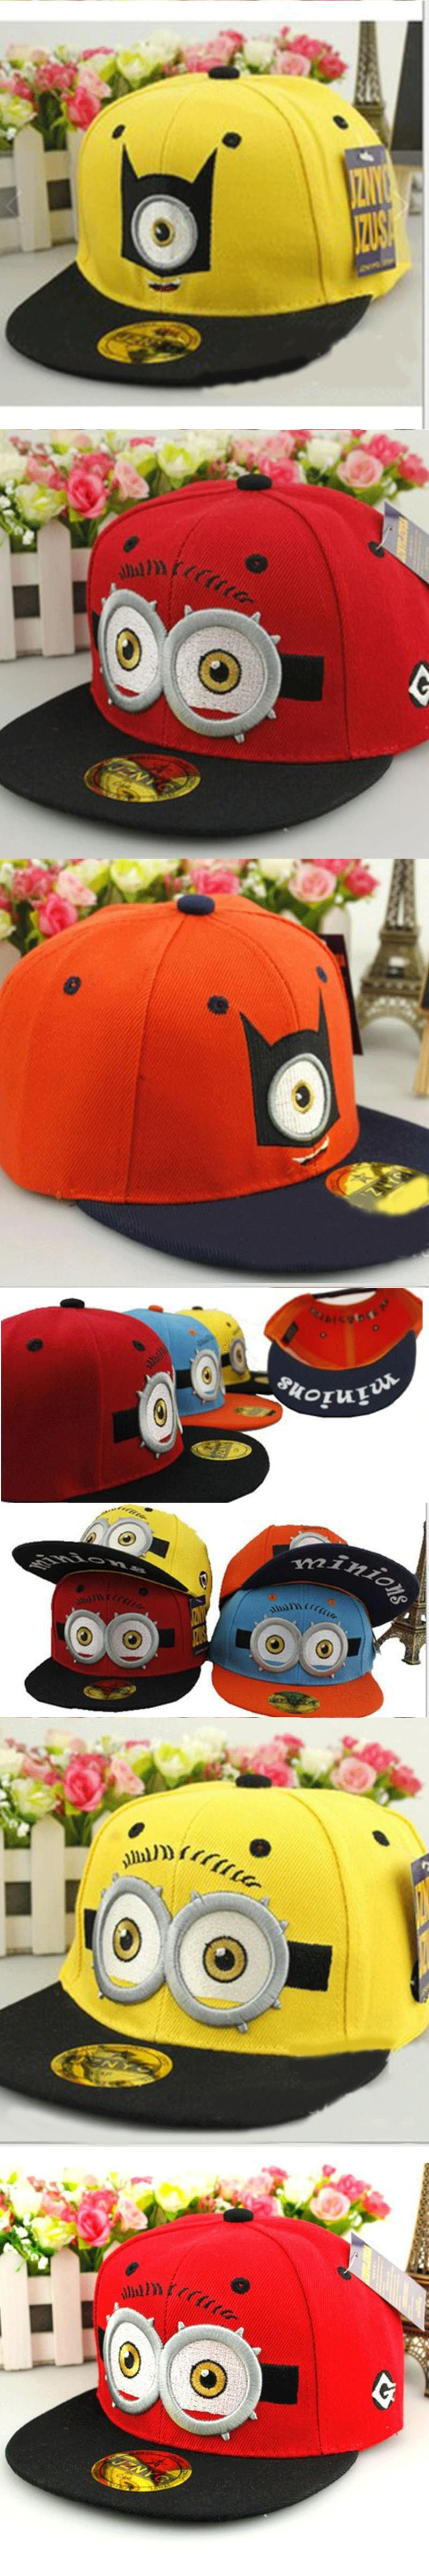 3D Cartoon Pattern Baseball Cap Small Yellow Man Minion Hip Hop Snapback Caps  Boy Girls Unisex b9406d5cc23e